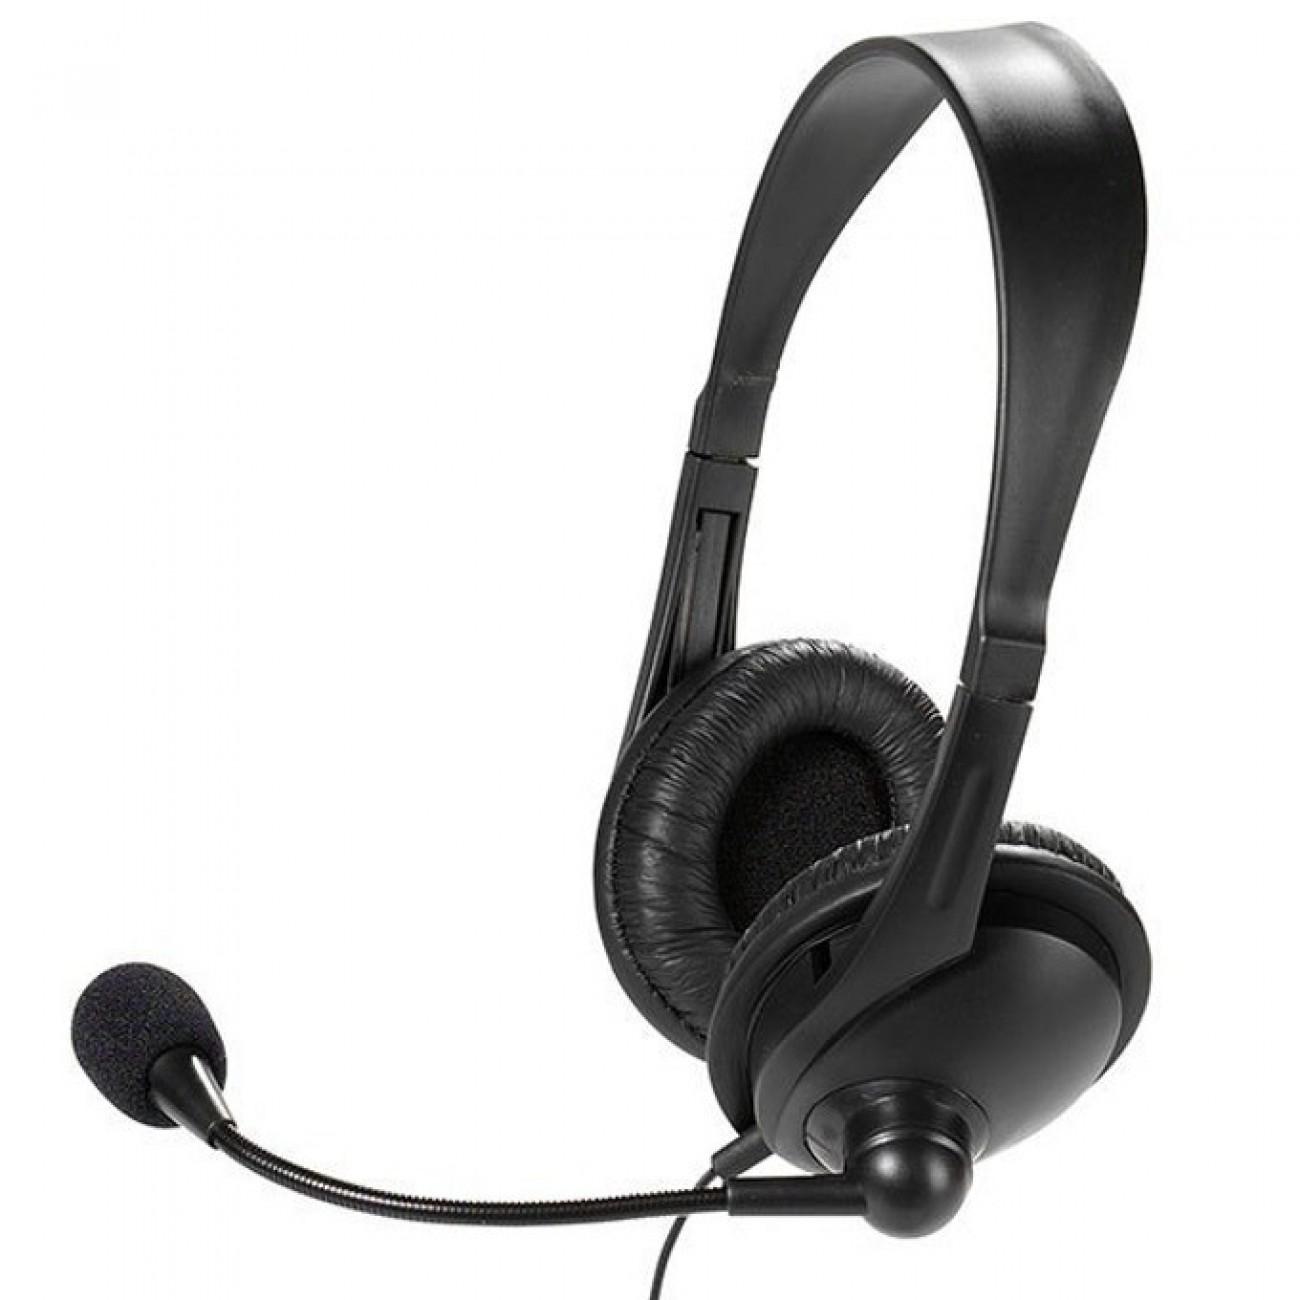 Слушалки Vivanco 36671, микрофон, контрол на звука, 3.5мм жак, черни в Слушалки -  | Alleop